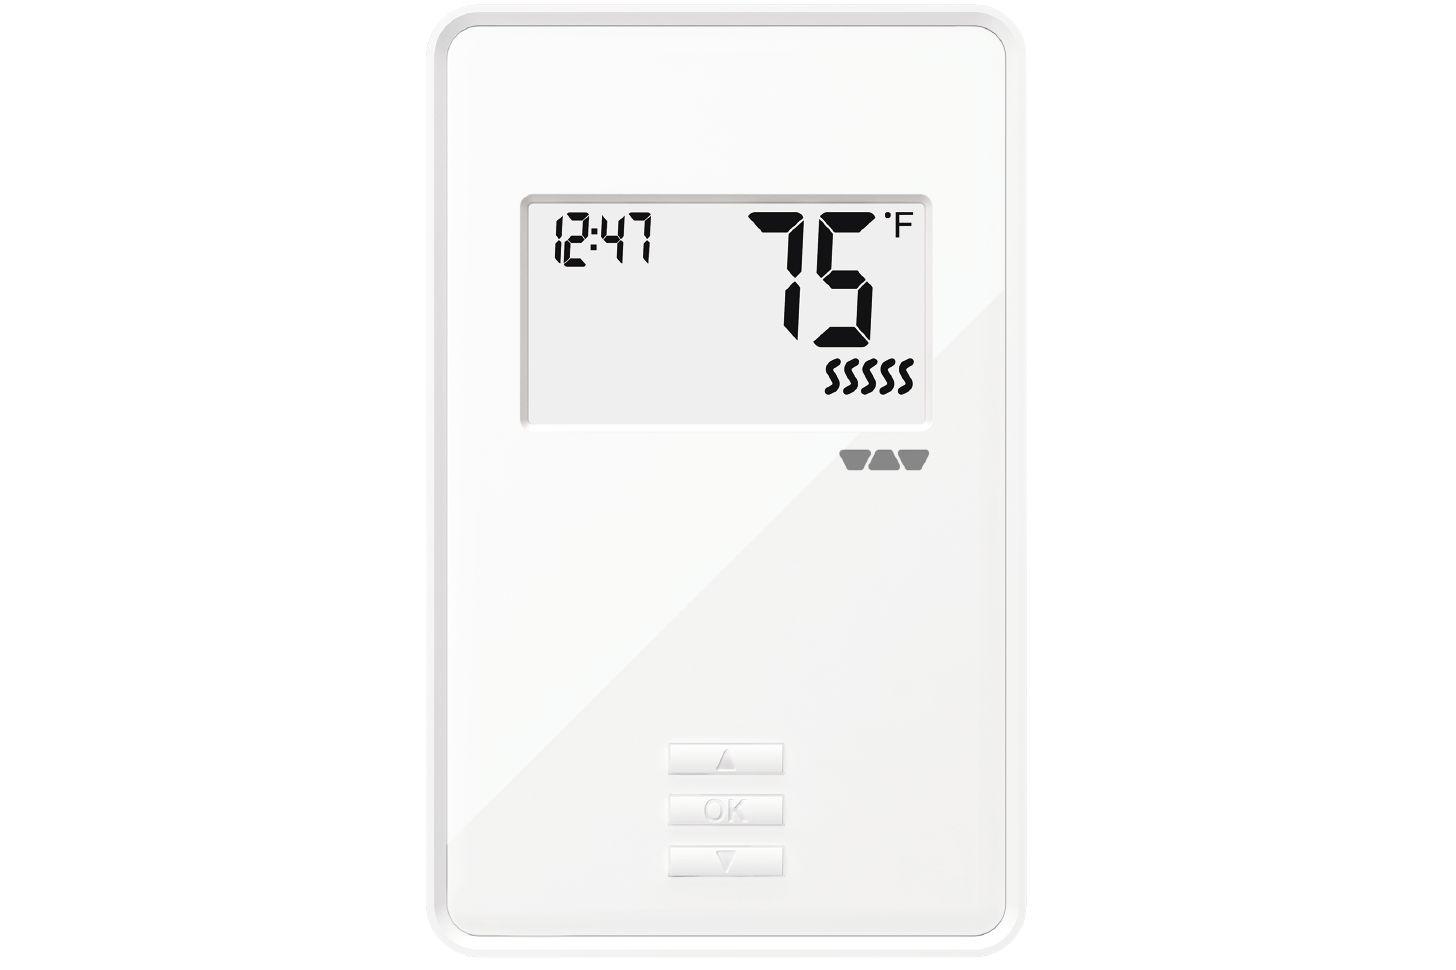 Ditra Heat E R Thermostat User Guide Schluter Com